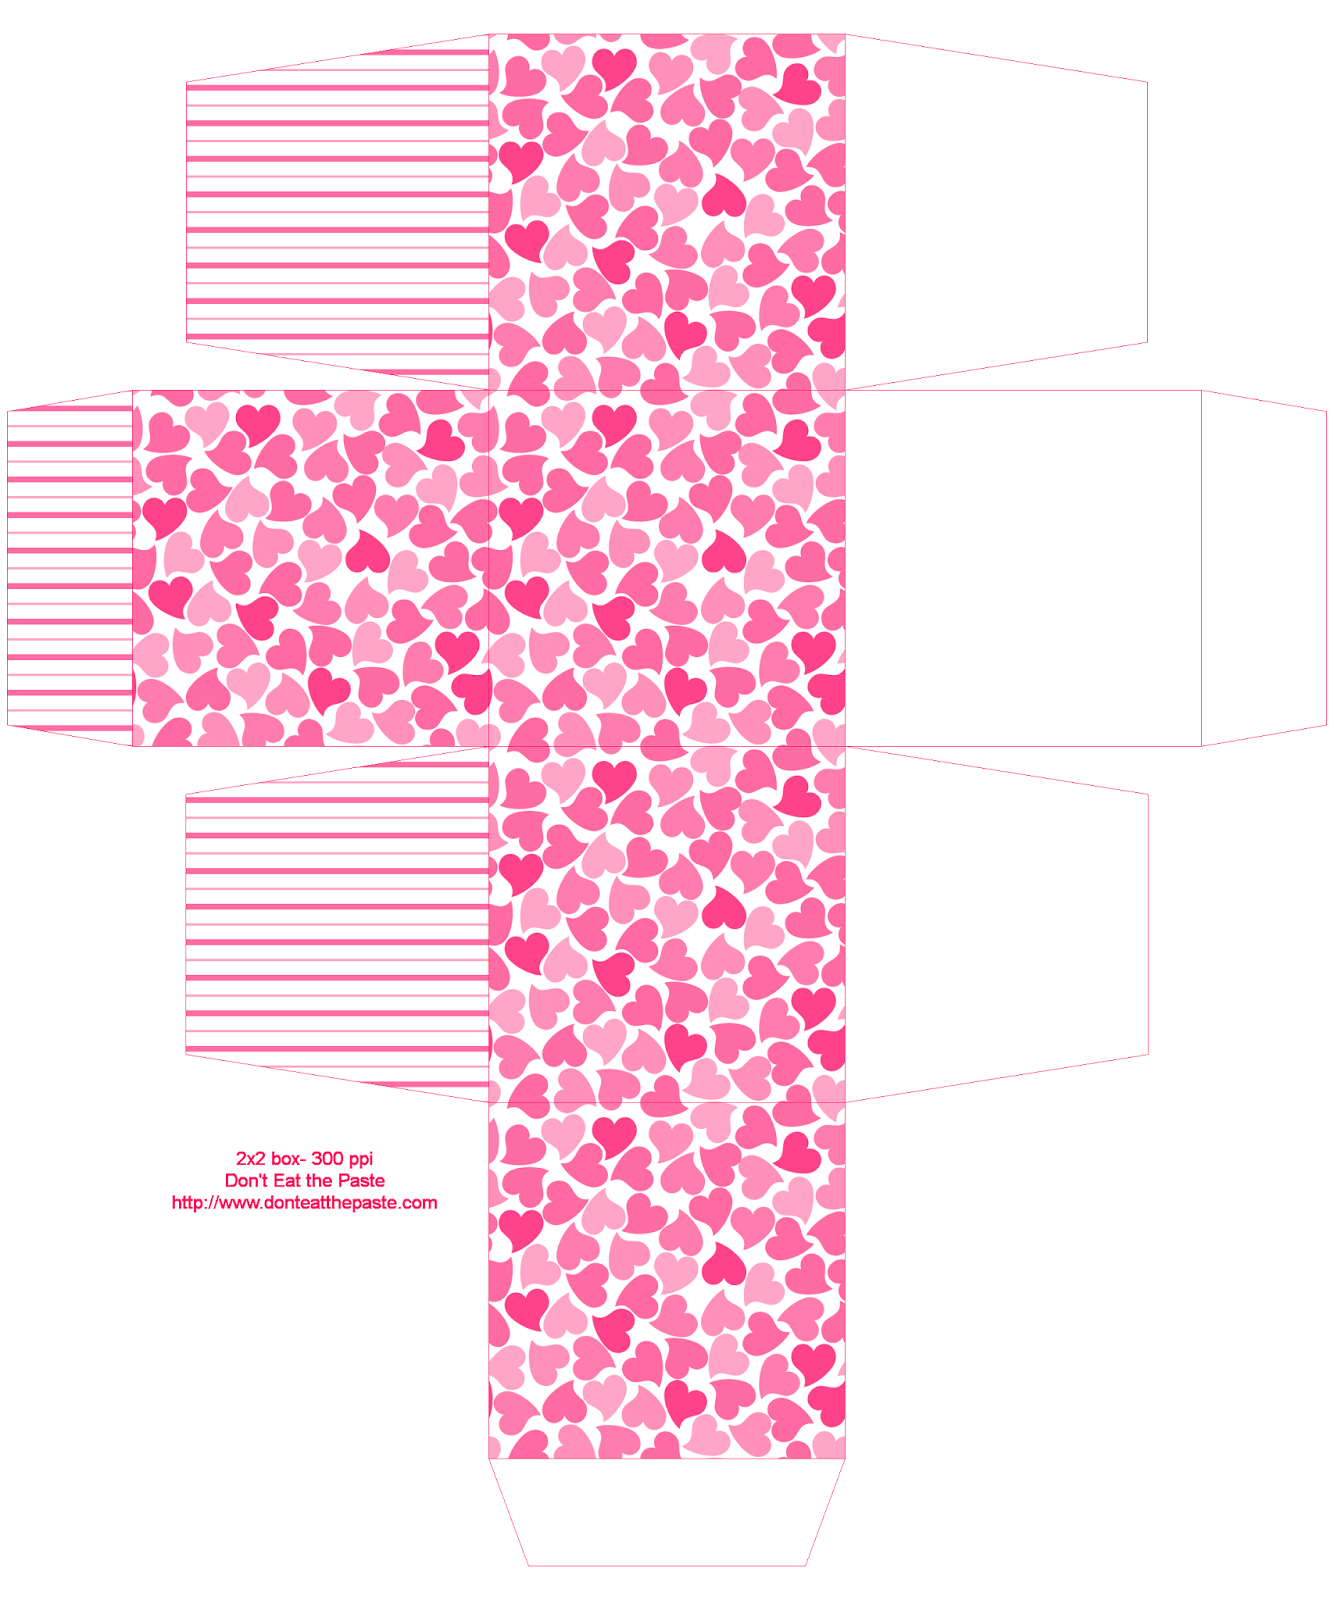 Printable Hearts Boxes